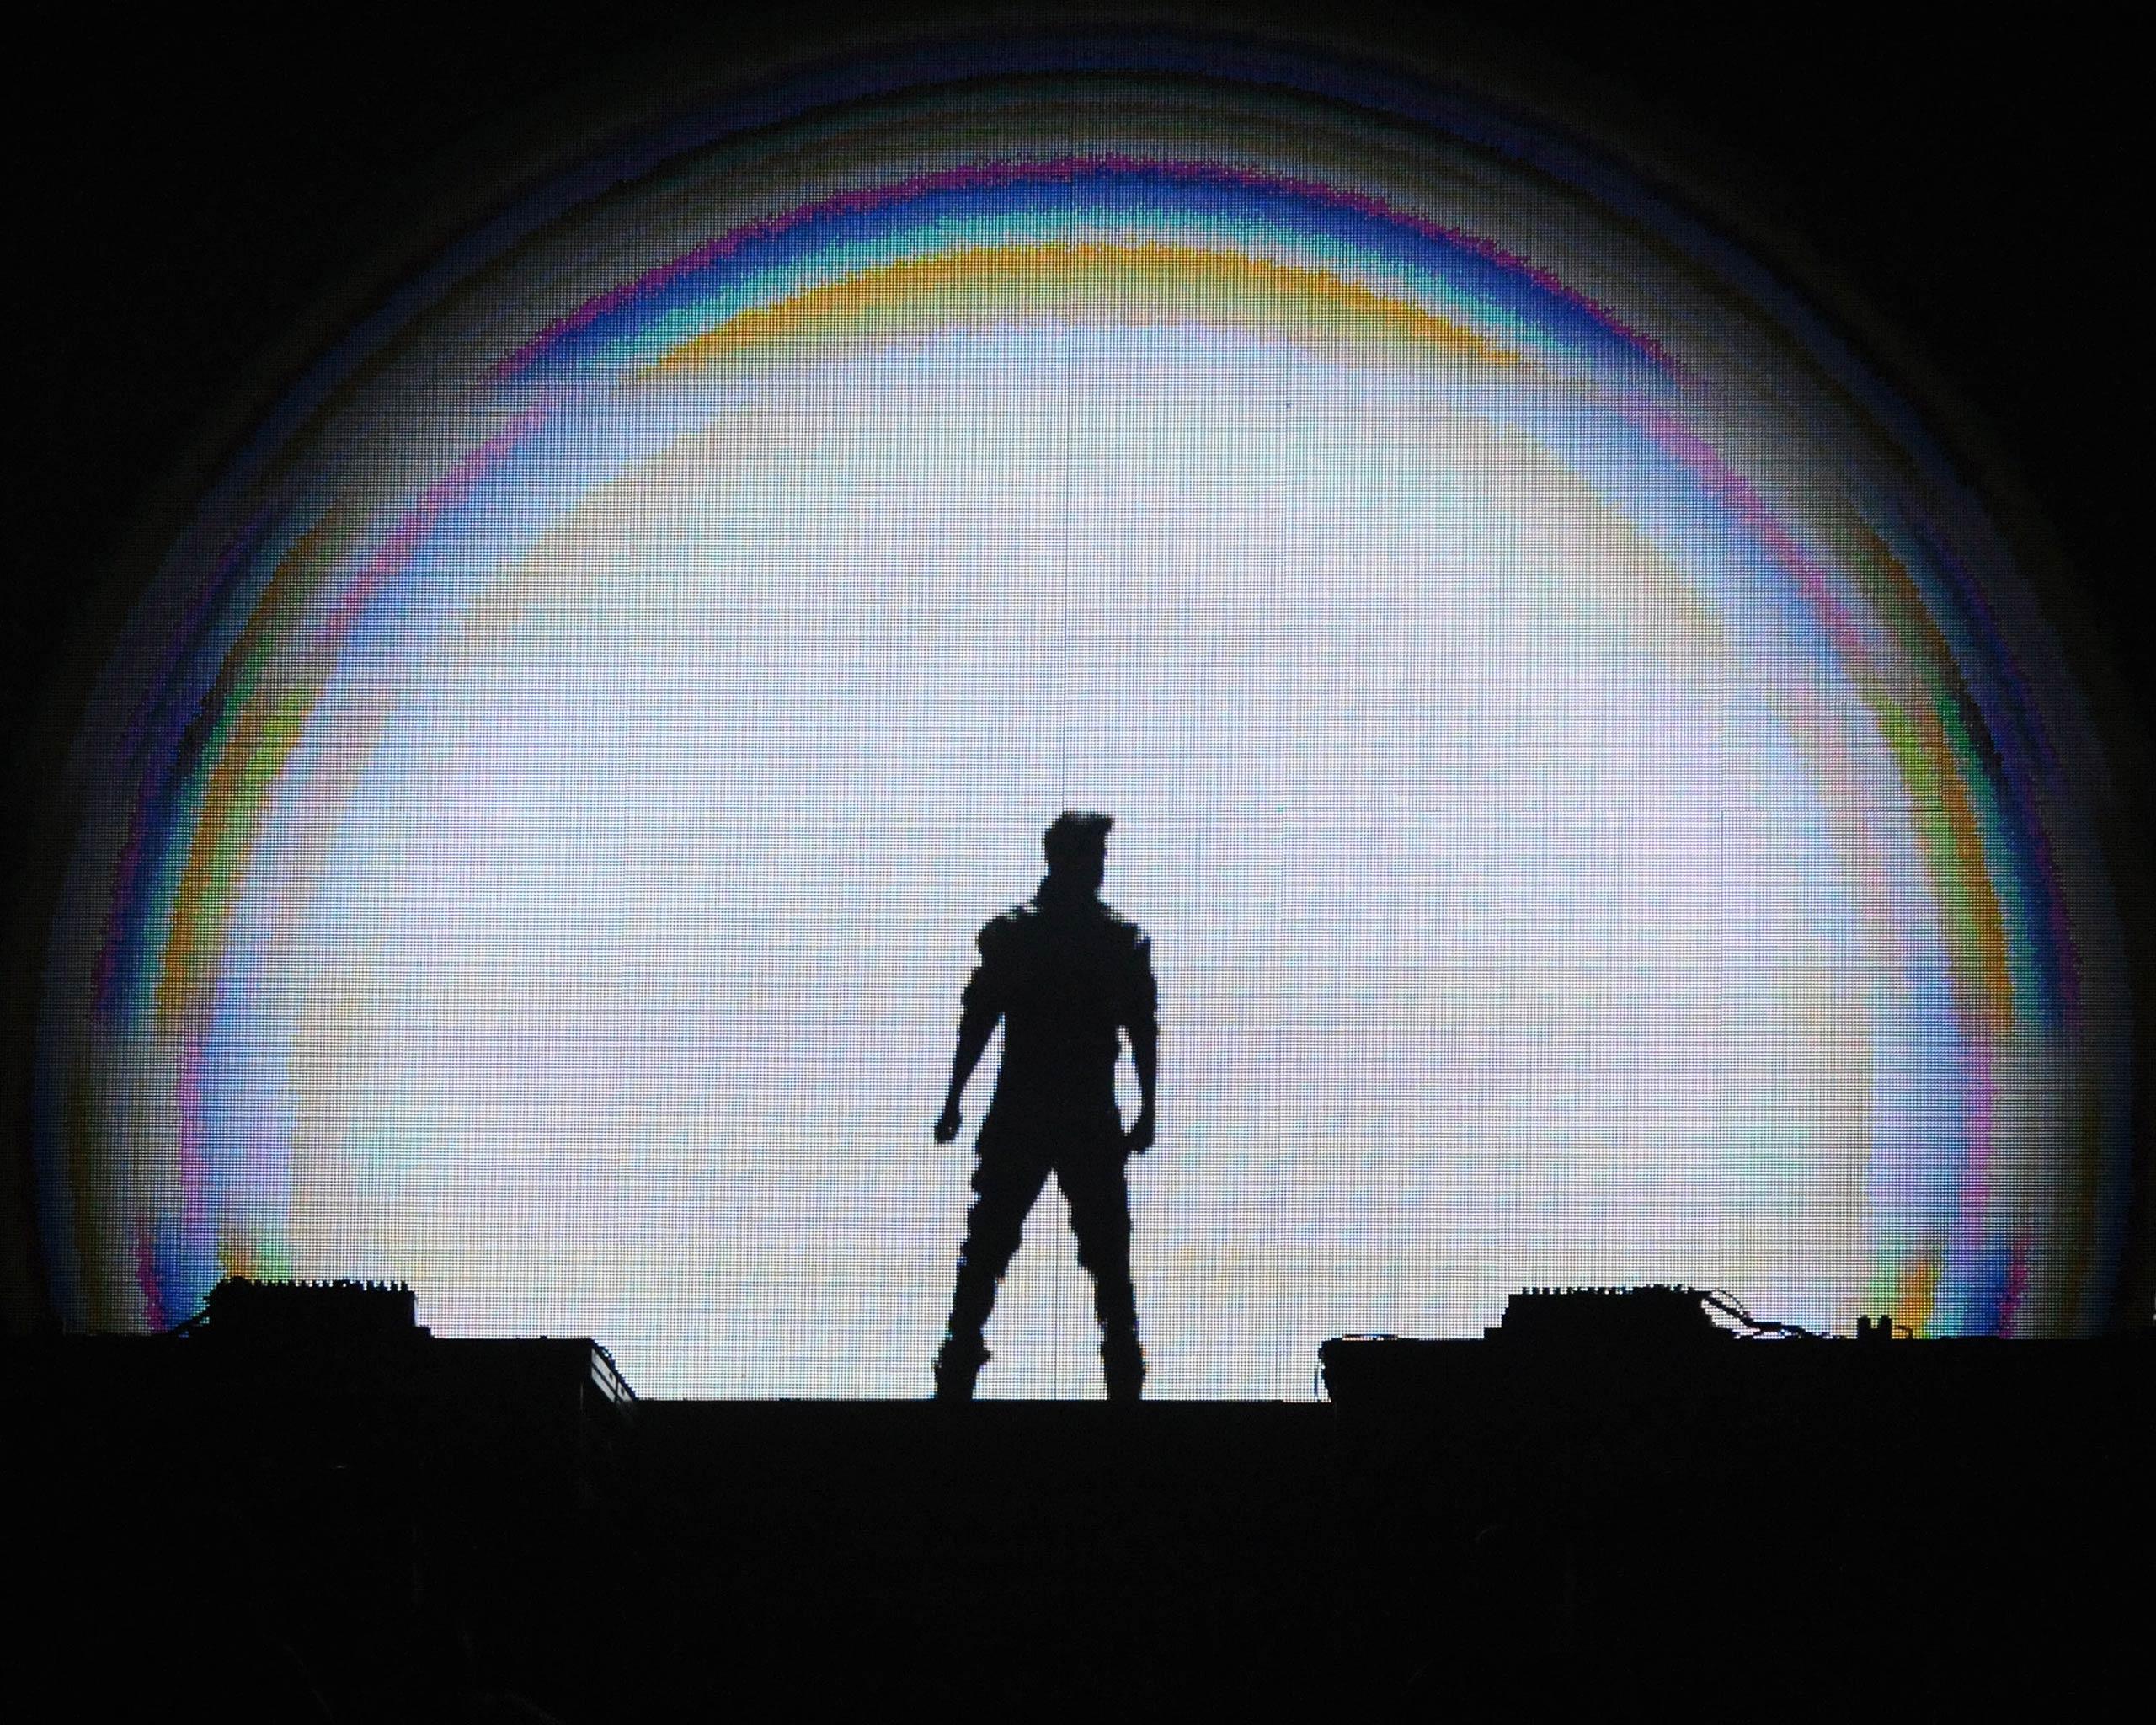 Justin Bieber performs at Philips Arena in Atlanta, Ga. in 2013.